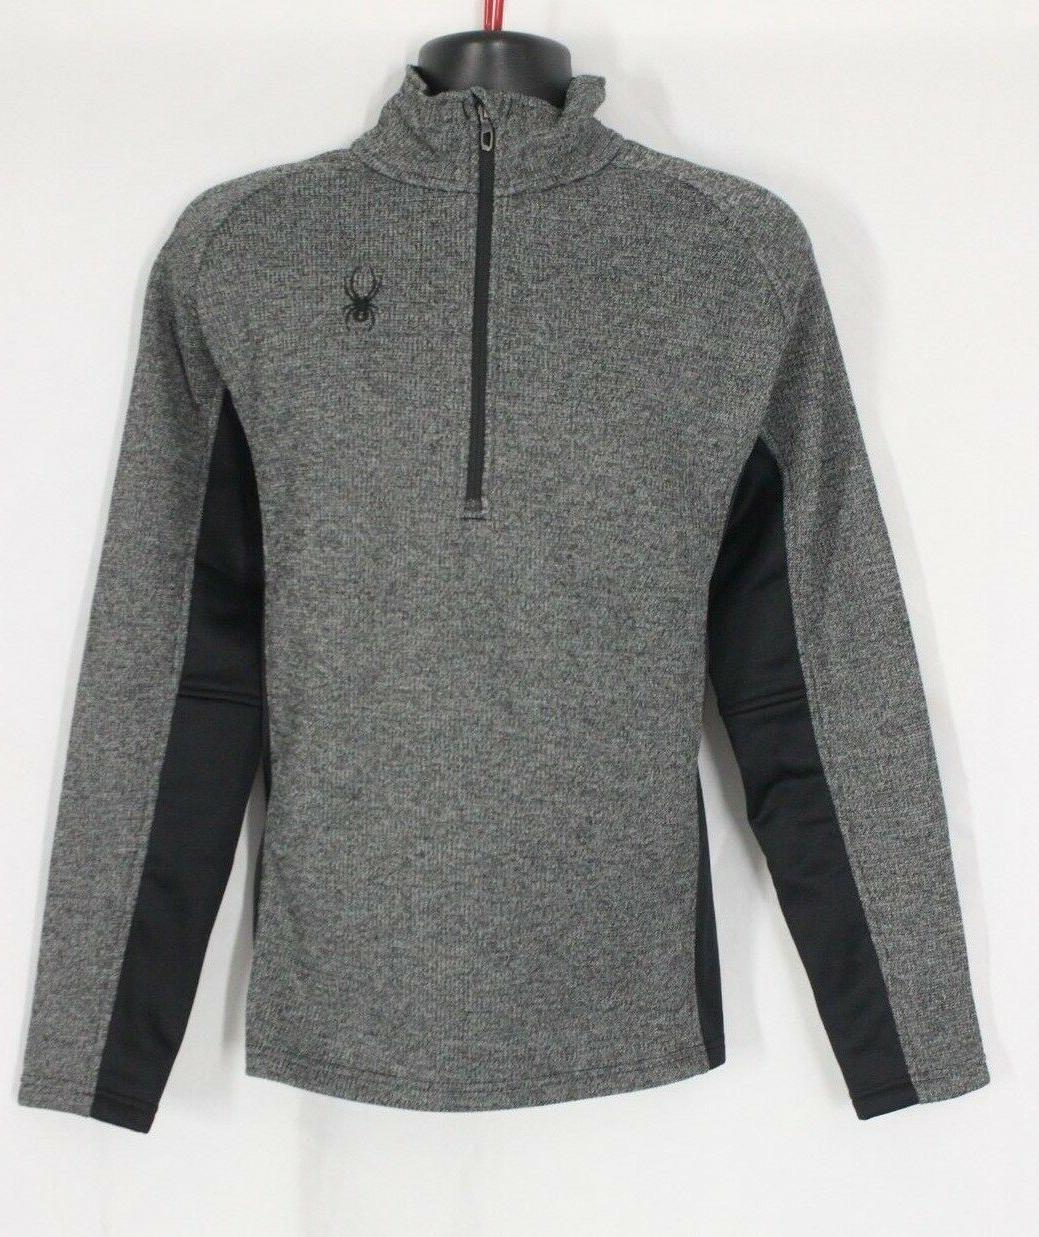 NEW Men's SPYDER Half Core Grey Green